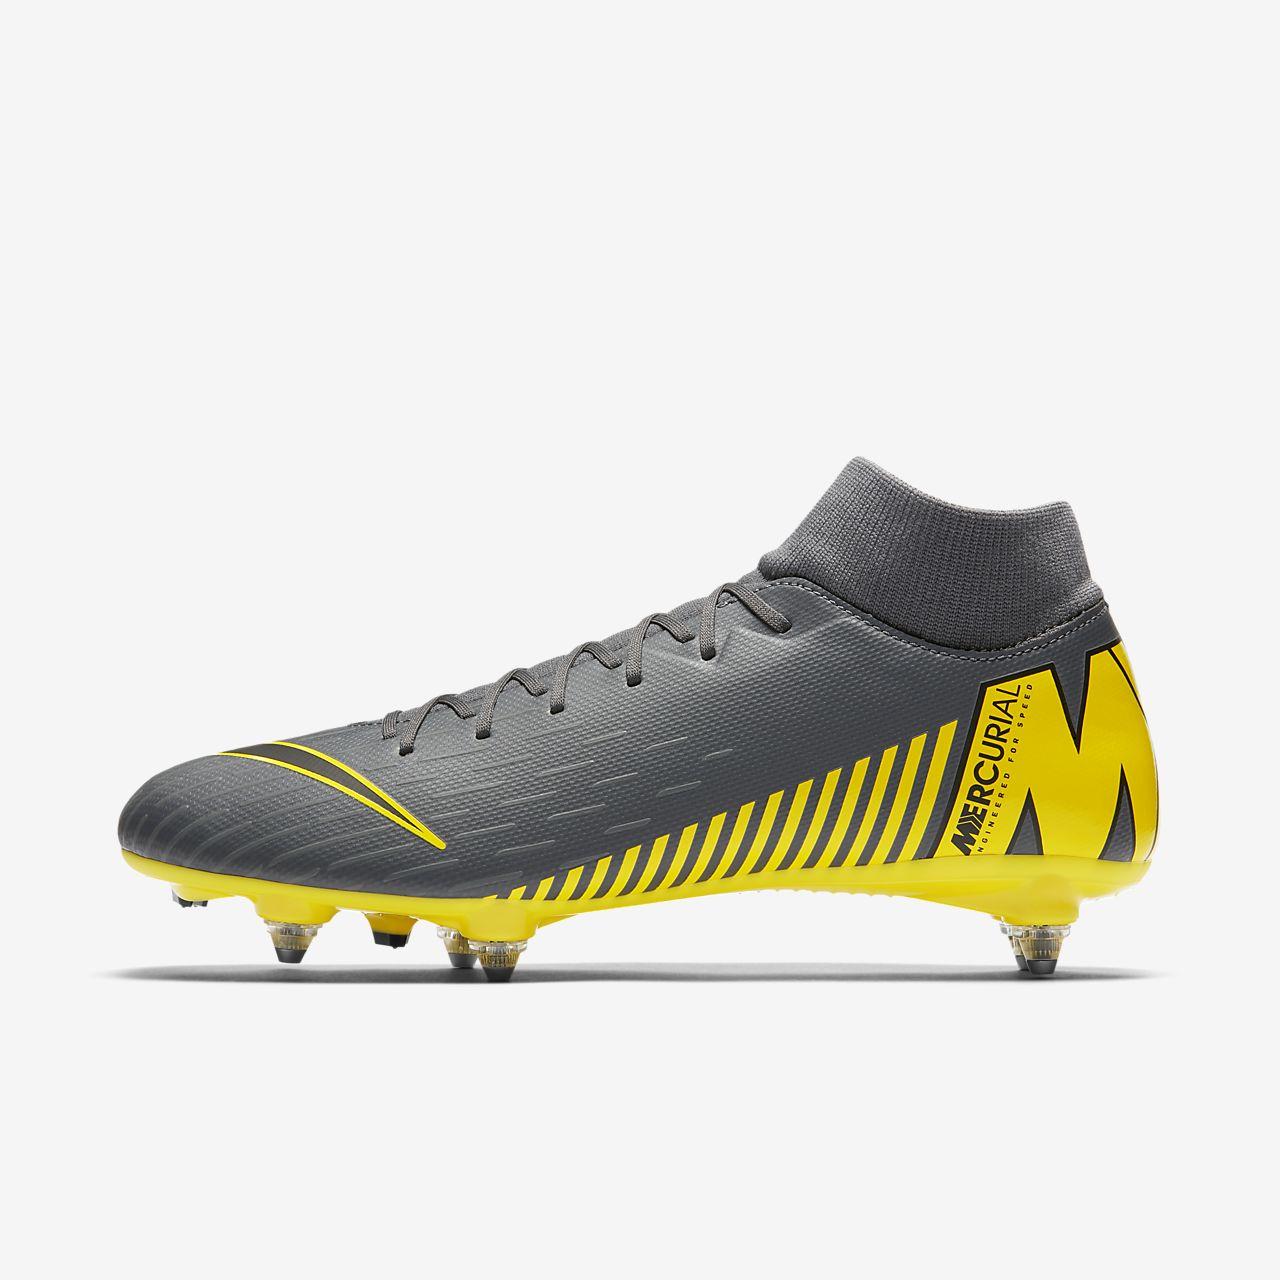 brand new 50e23 b475a ... Chaussure de football à crampons pour terrain gras Nike Mercurial  Superfly VI Academy SG-PRO